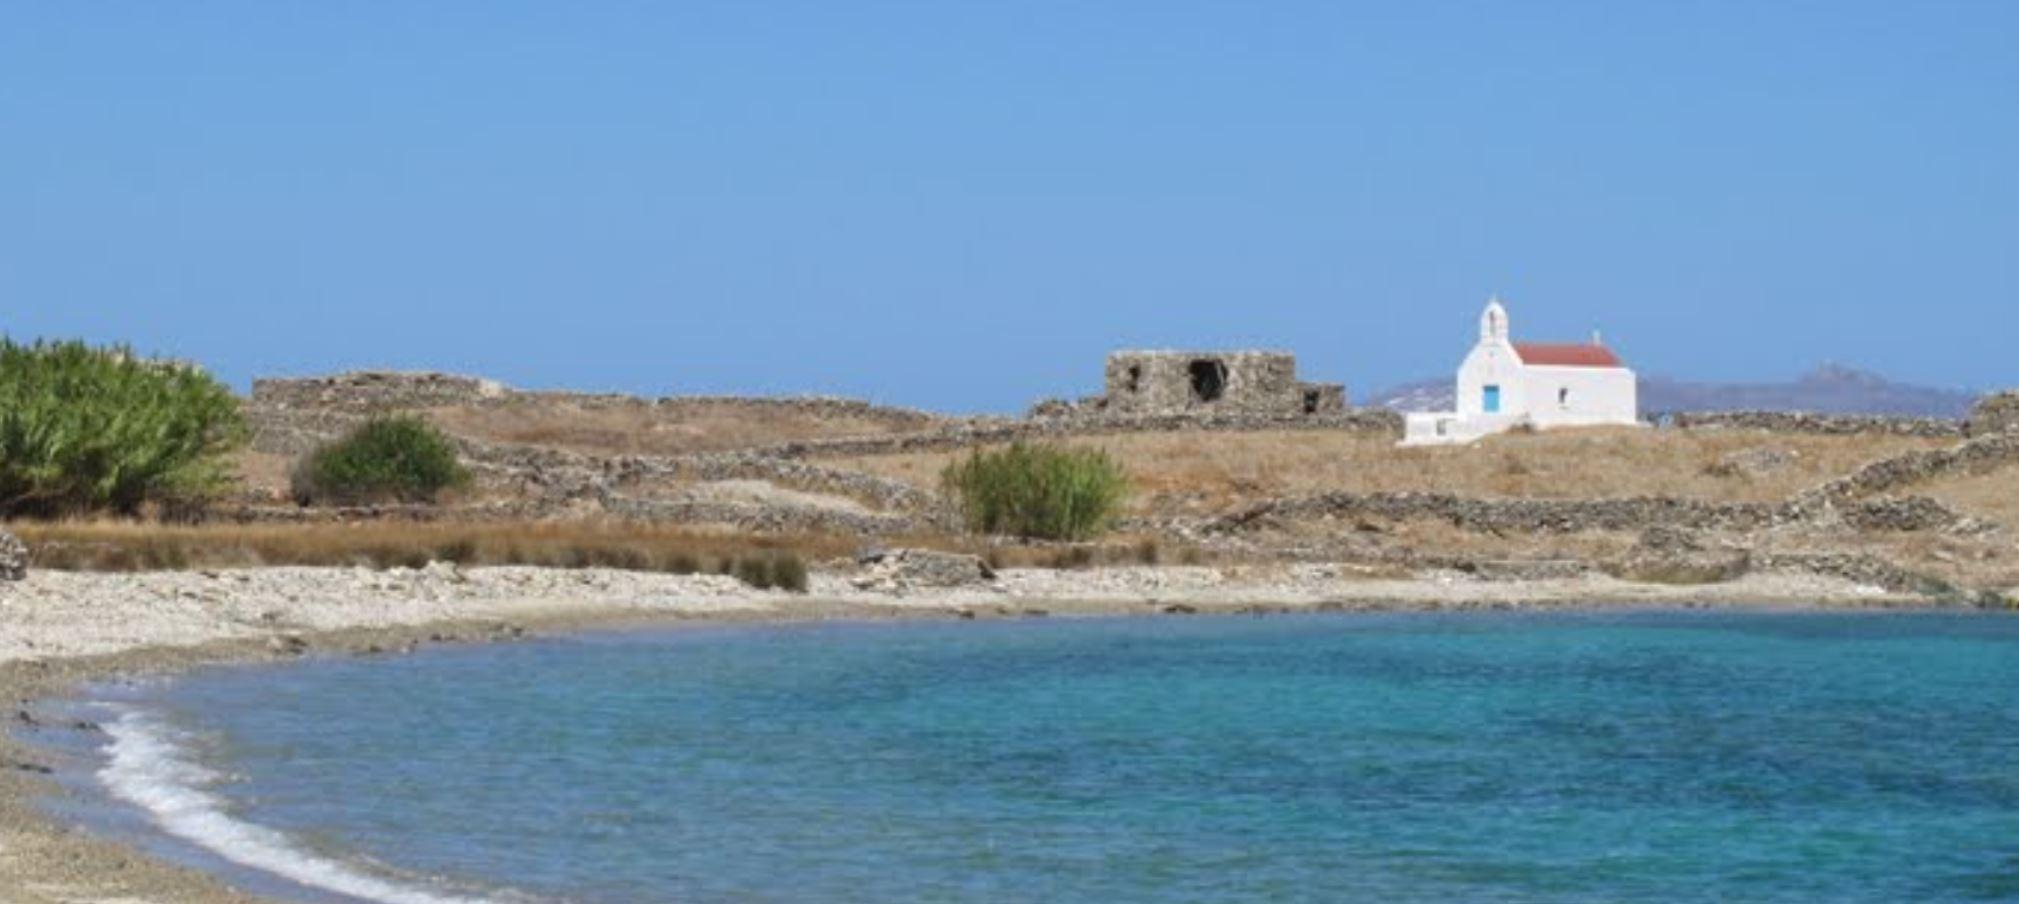 Rhenia island Church